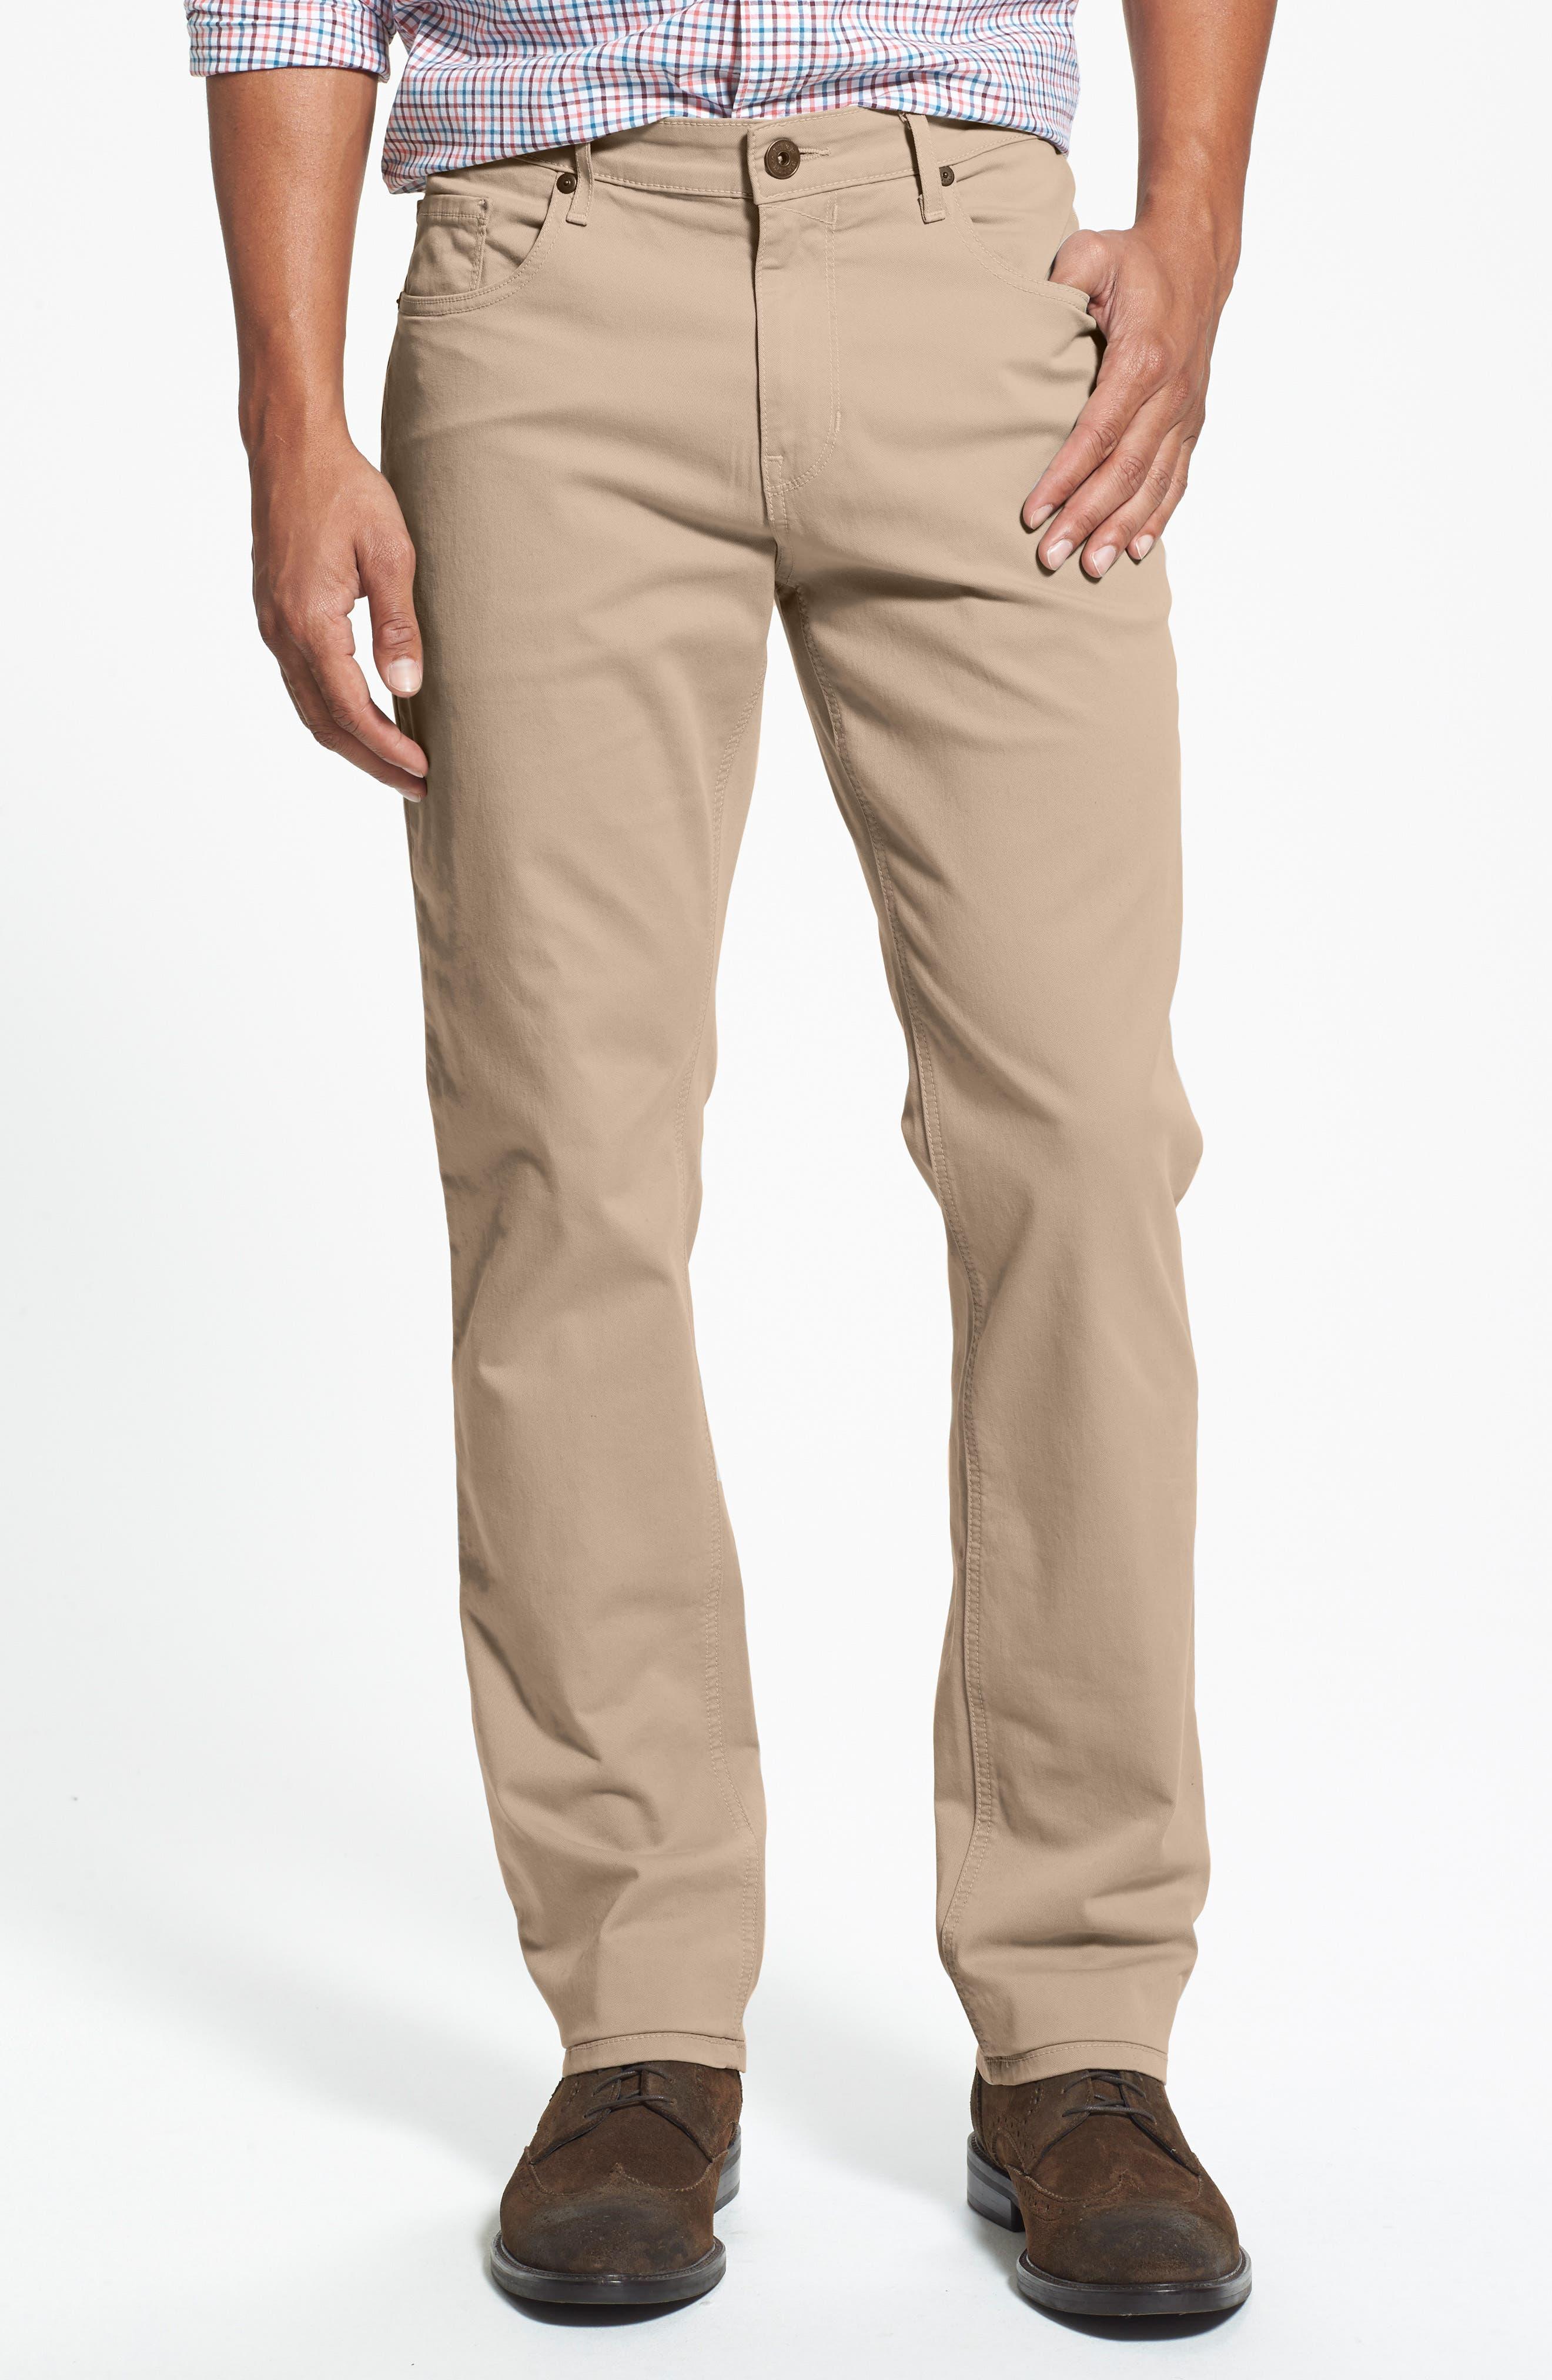 Normandie Slim Straight Leg Twill Pants,                         Main,                         color, Timberwolf